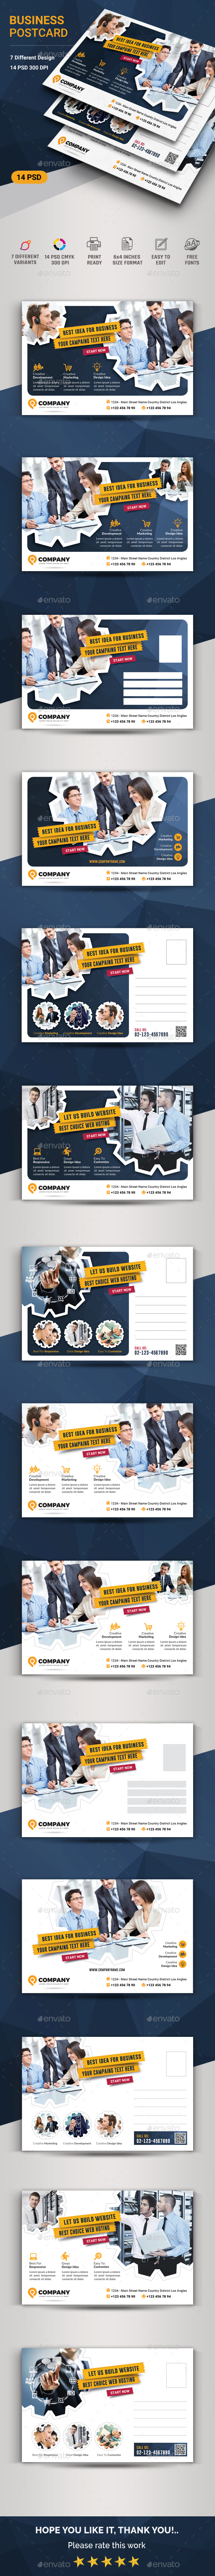 Business Postcard - Cards & Invites Print Templates